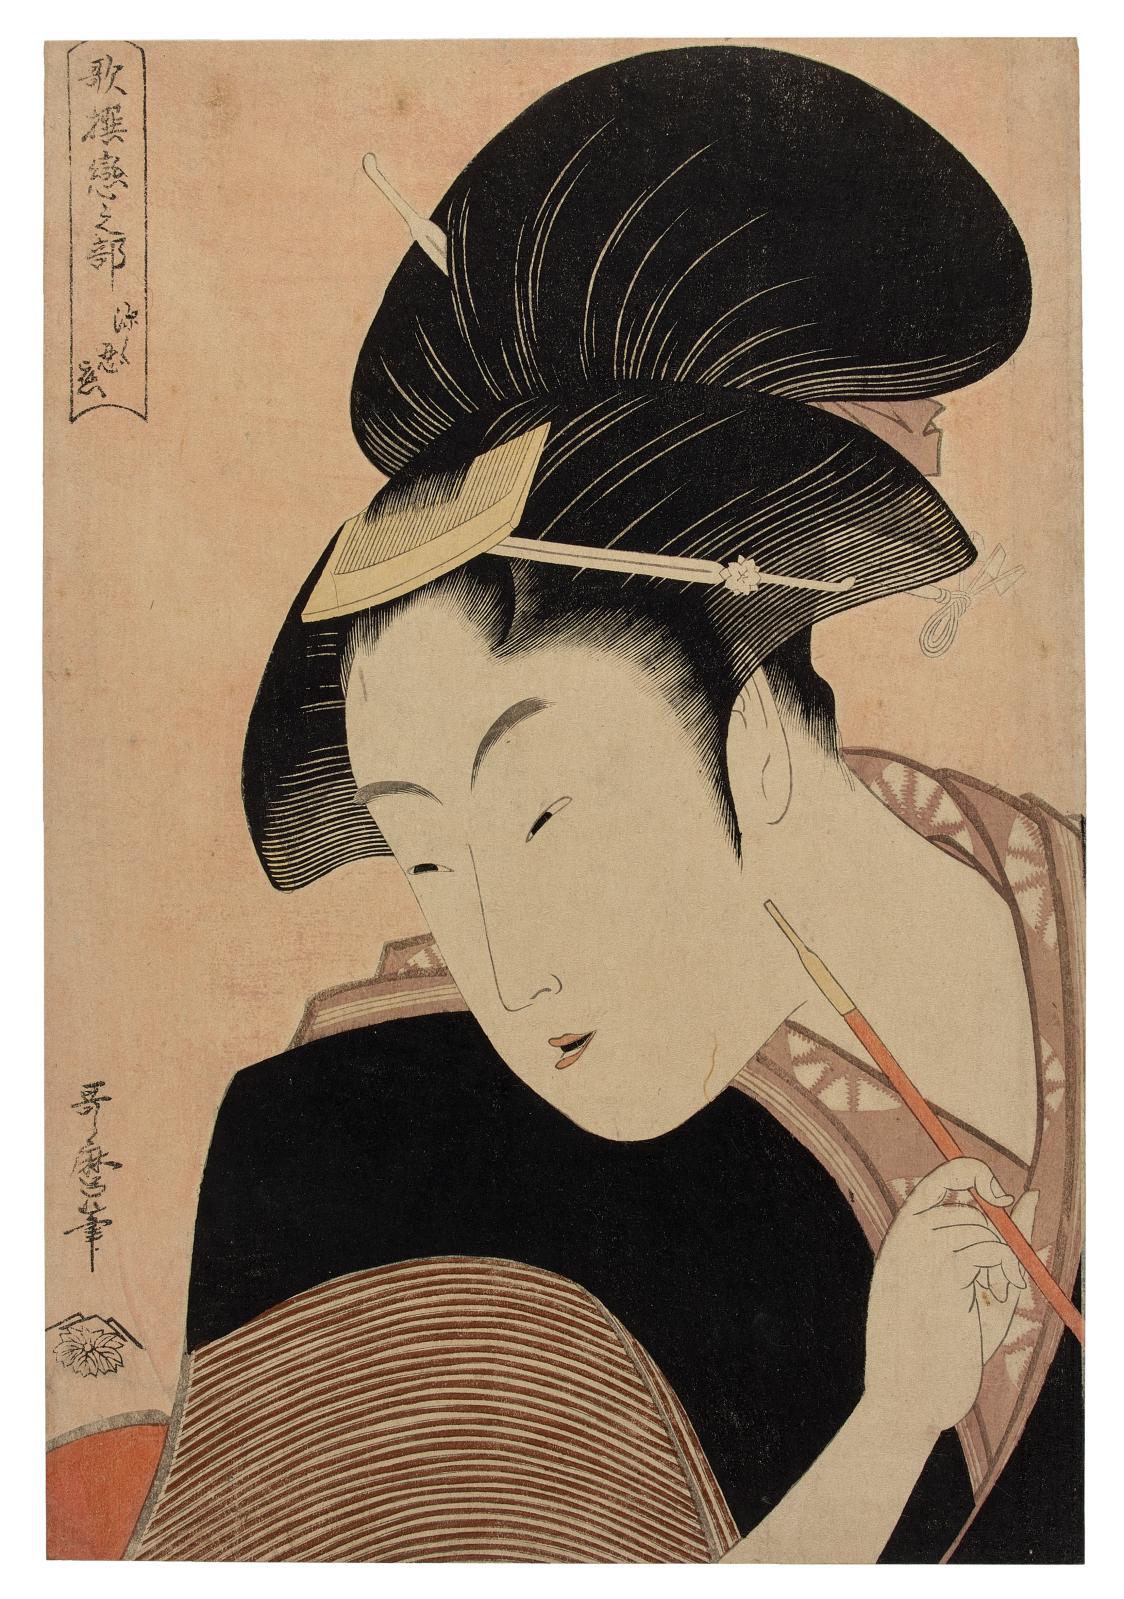 Kitagawa Utamaro (1753? - 1806), L'Amour caché (Fukaku shinobu koi), de la série «Anthologie poétique: section de l'amour» (Kasen koi no bu), estamp